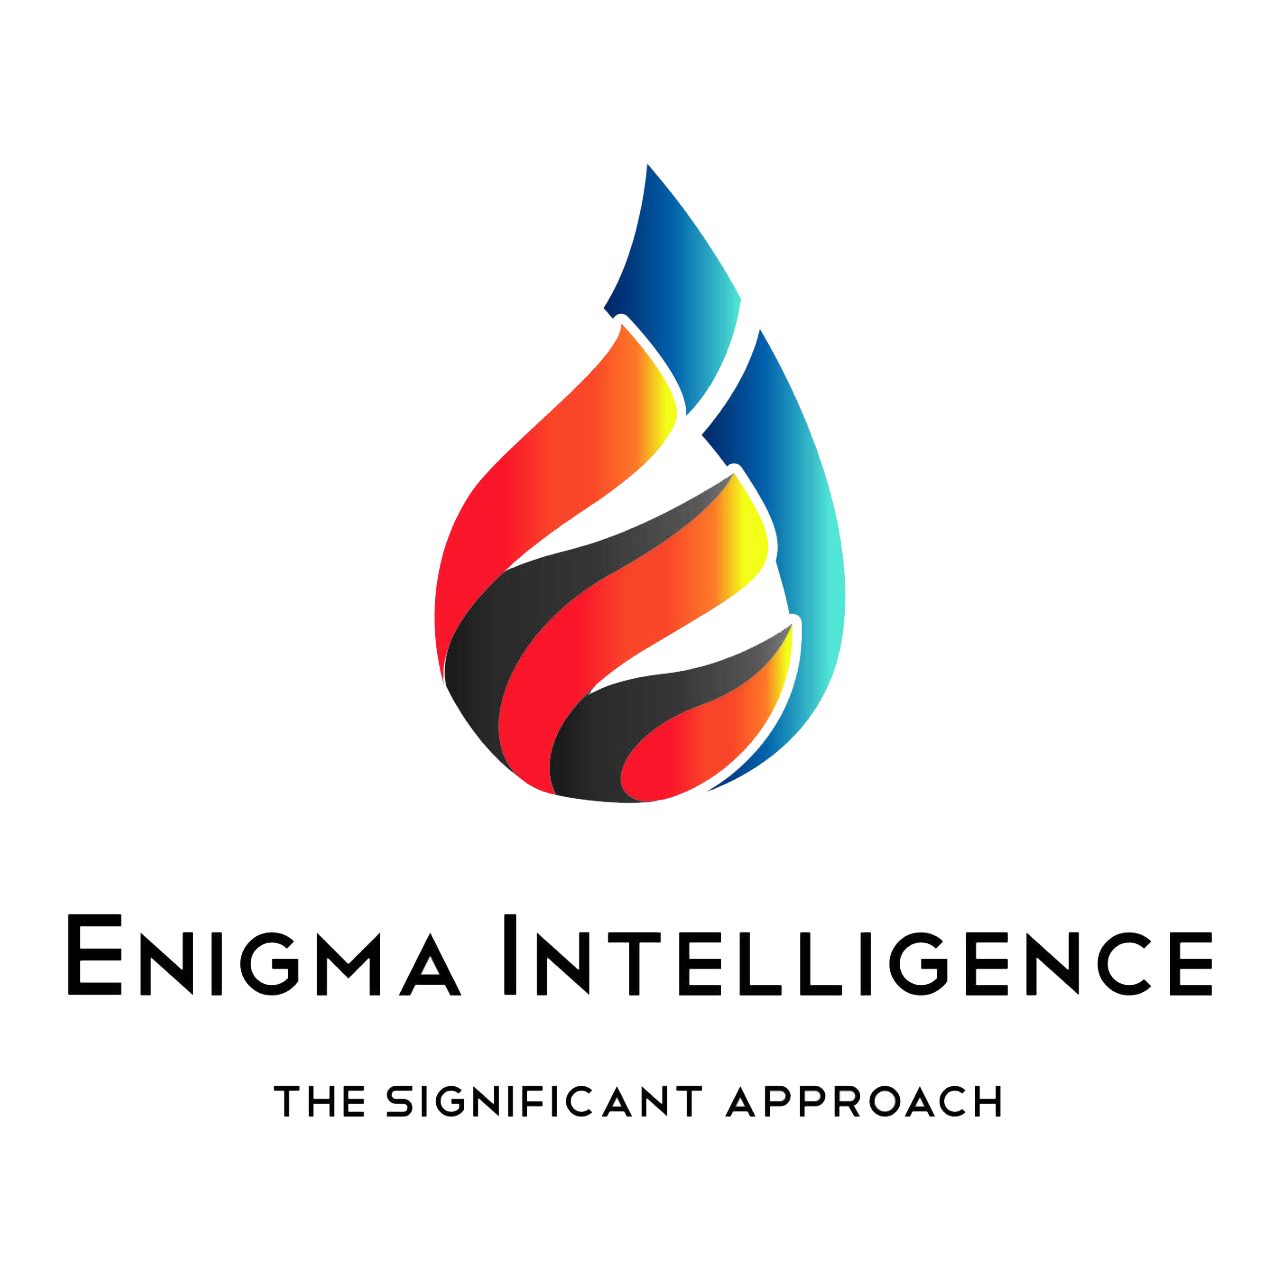 Enigma Intelligence